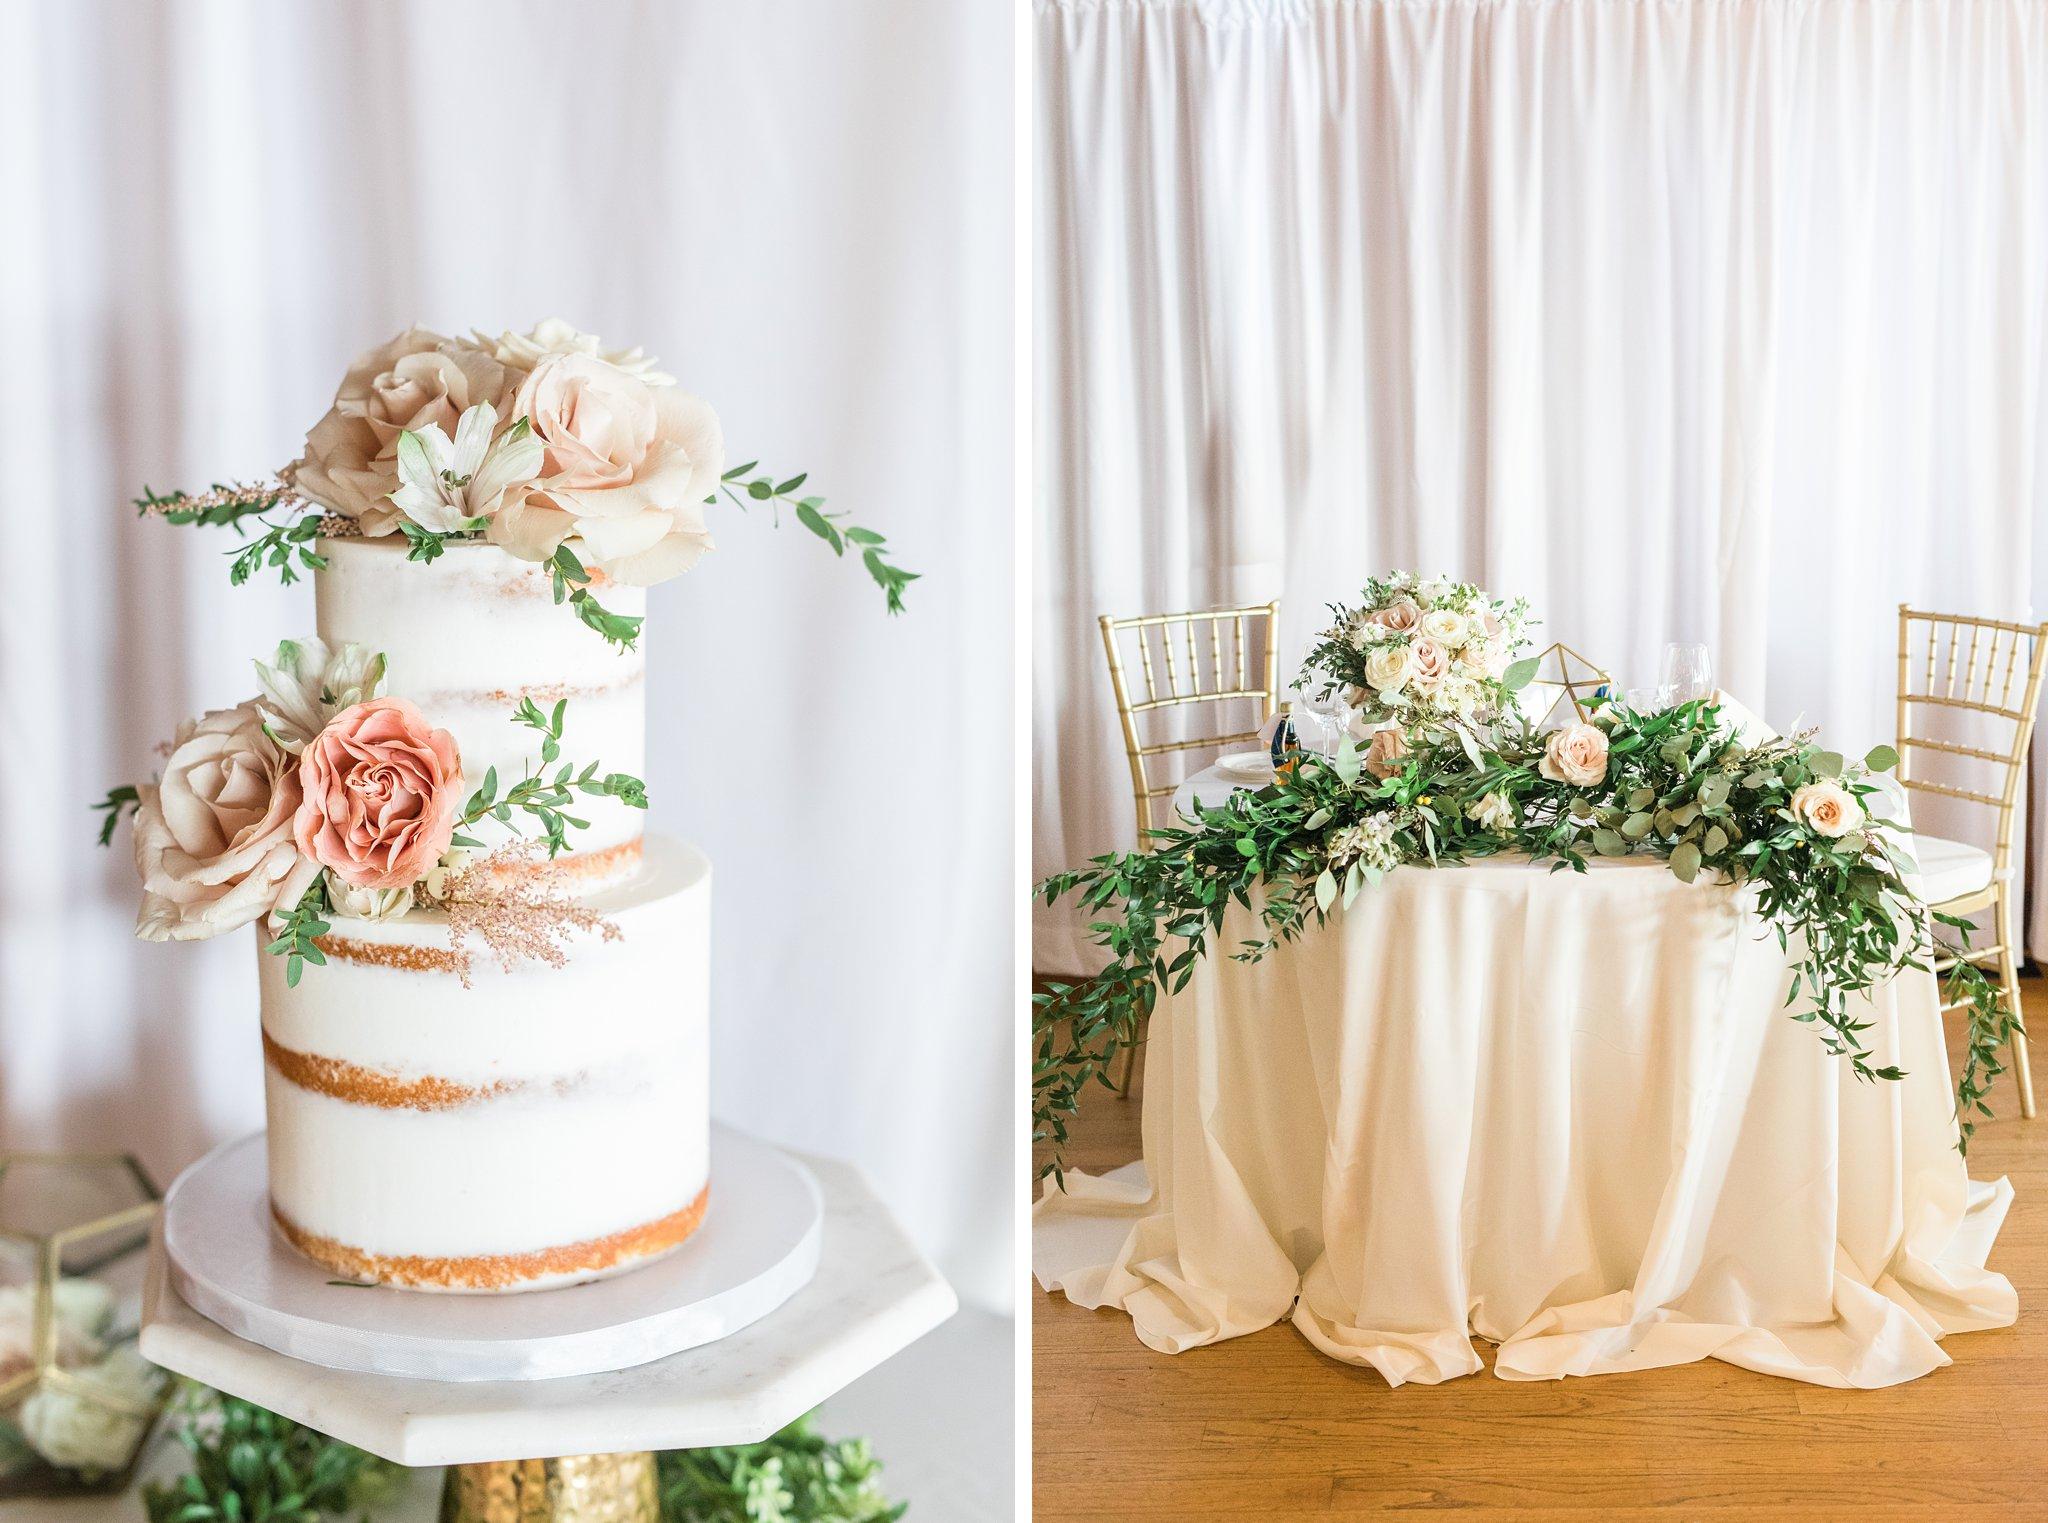 Batter up bakery naked wedding cake, sweetheart table, Britannia Yacht Club Wedding Photos, Amy Pinder Photography